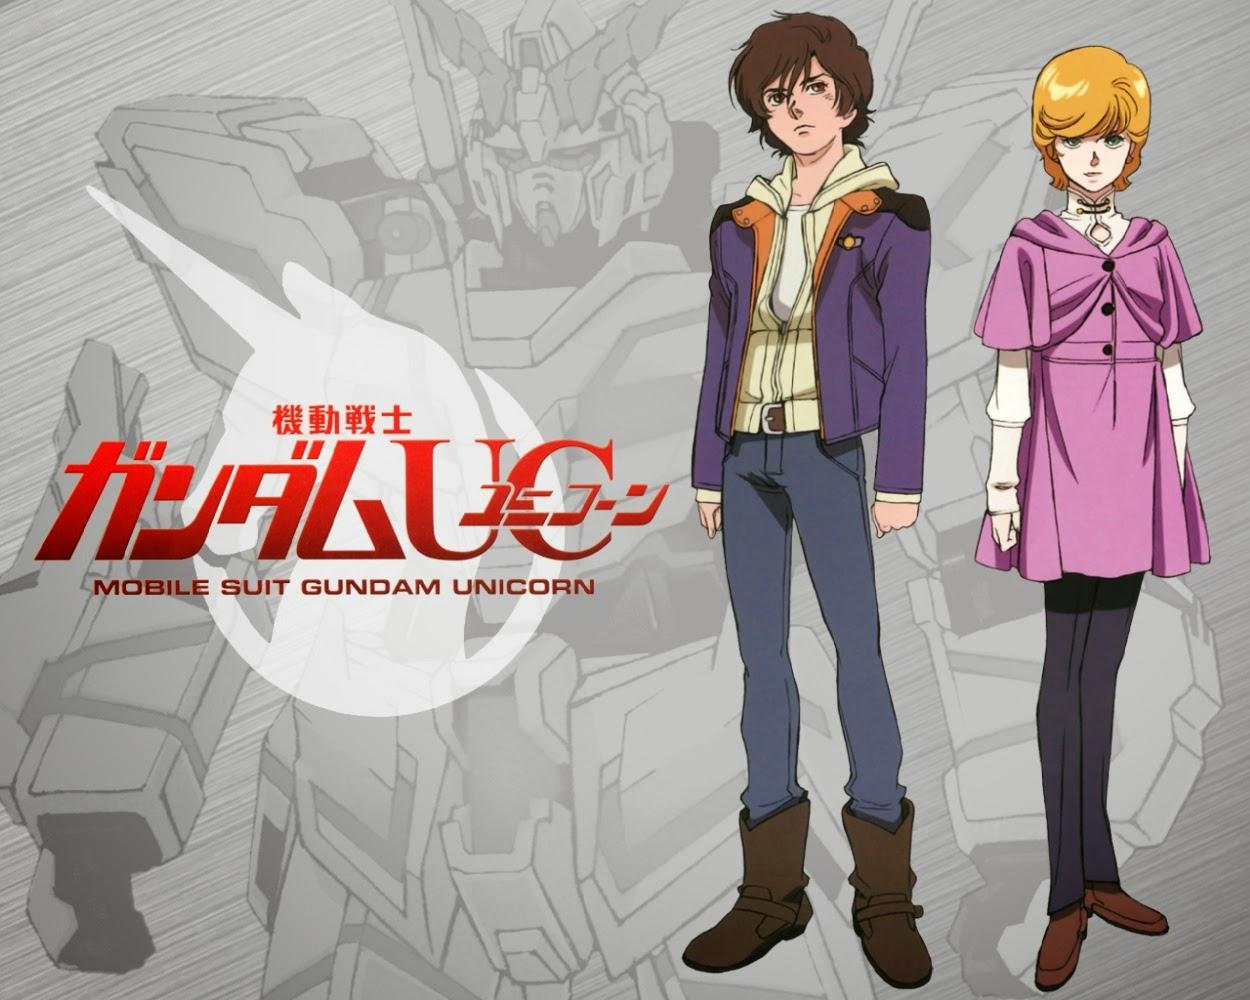 ReefTV: Anime Review : Mobile Suit Gundam Unicorn